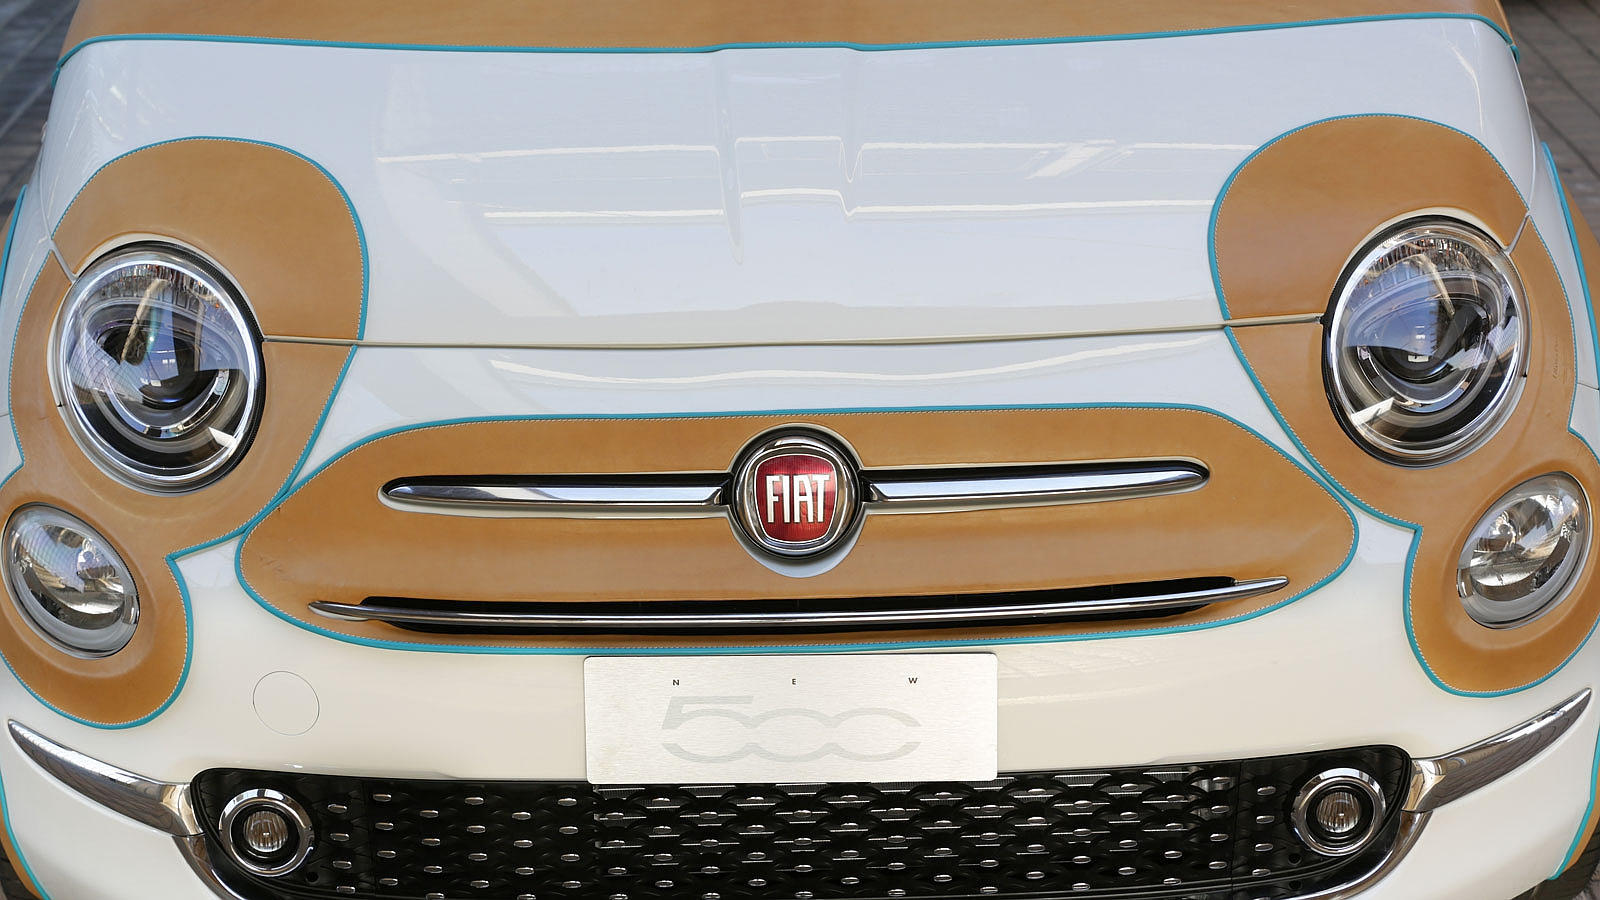 Foto de Fiat 500 x Stefano Conticelli (1/9)